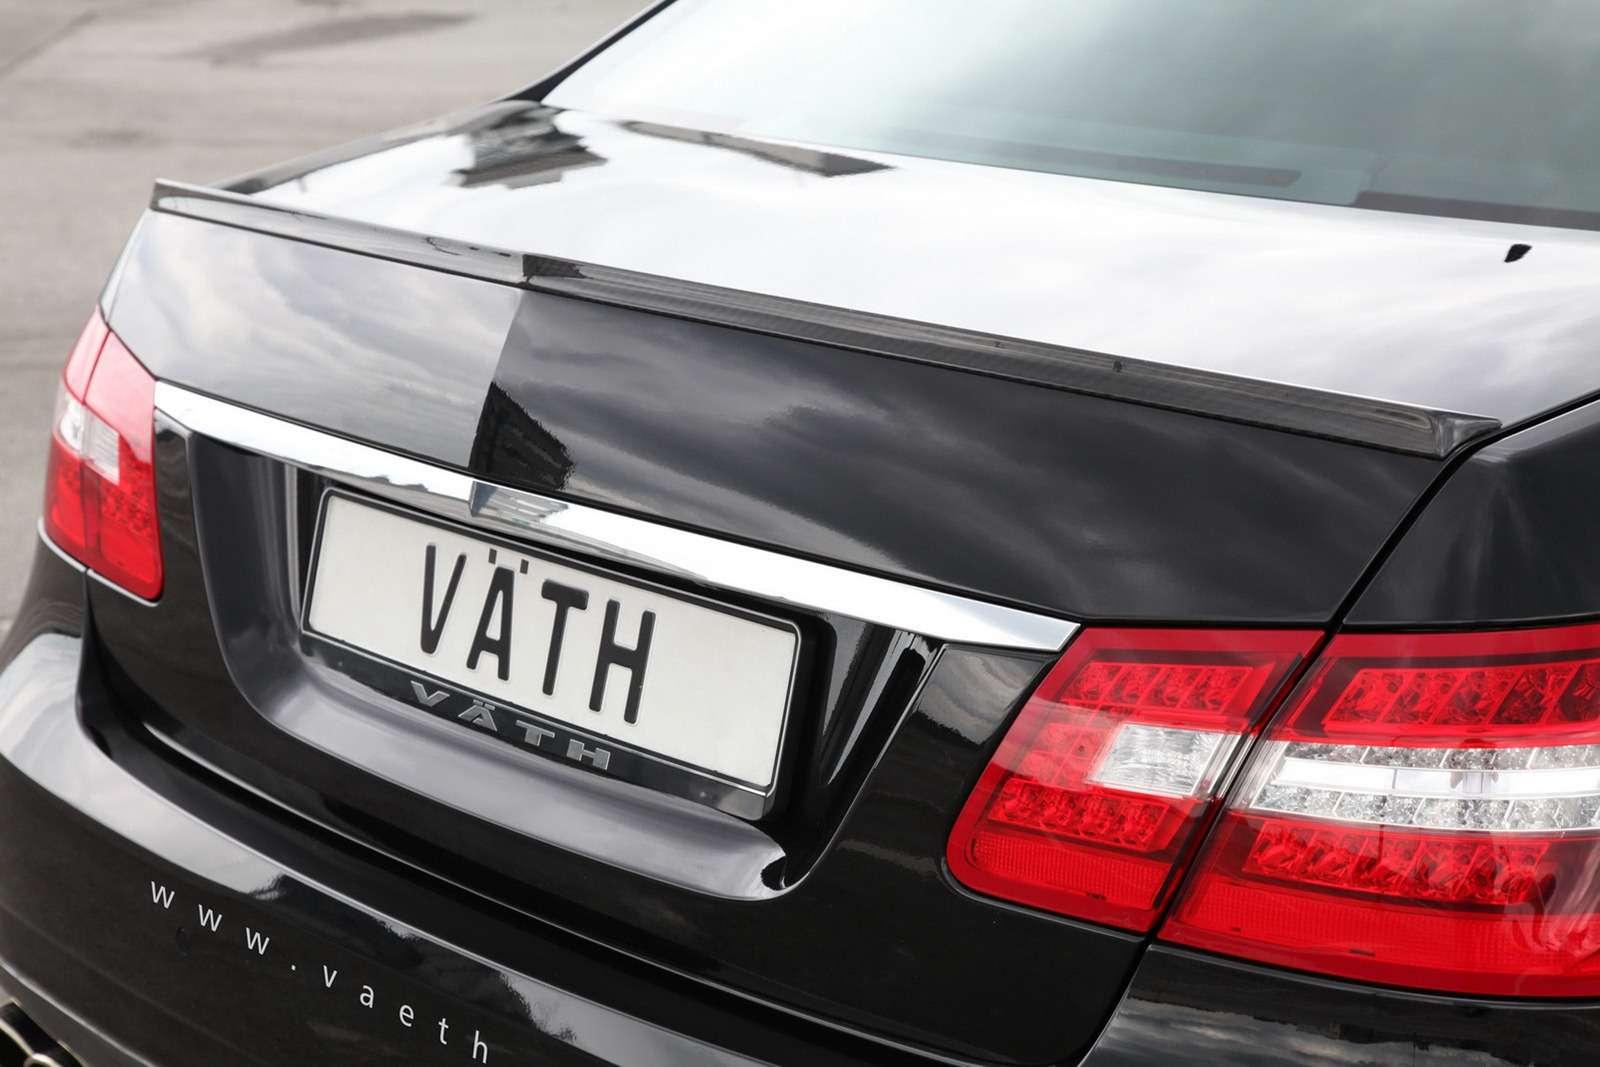 Mercedes-Benz E500 Vath tuning